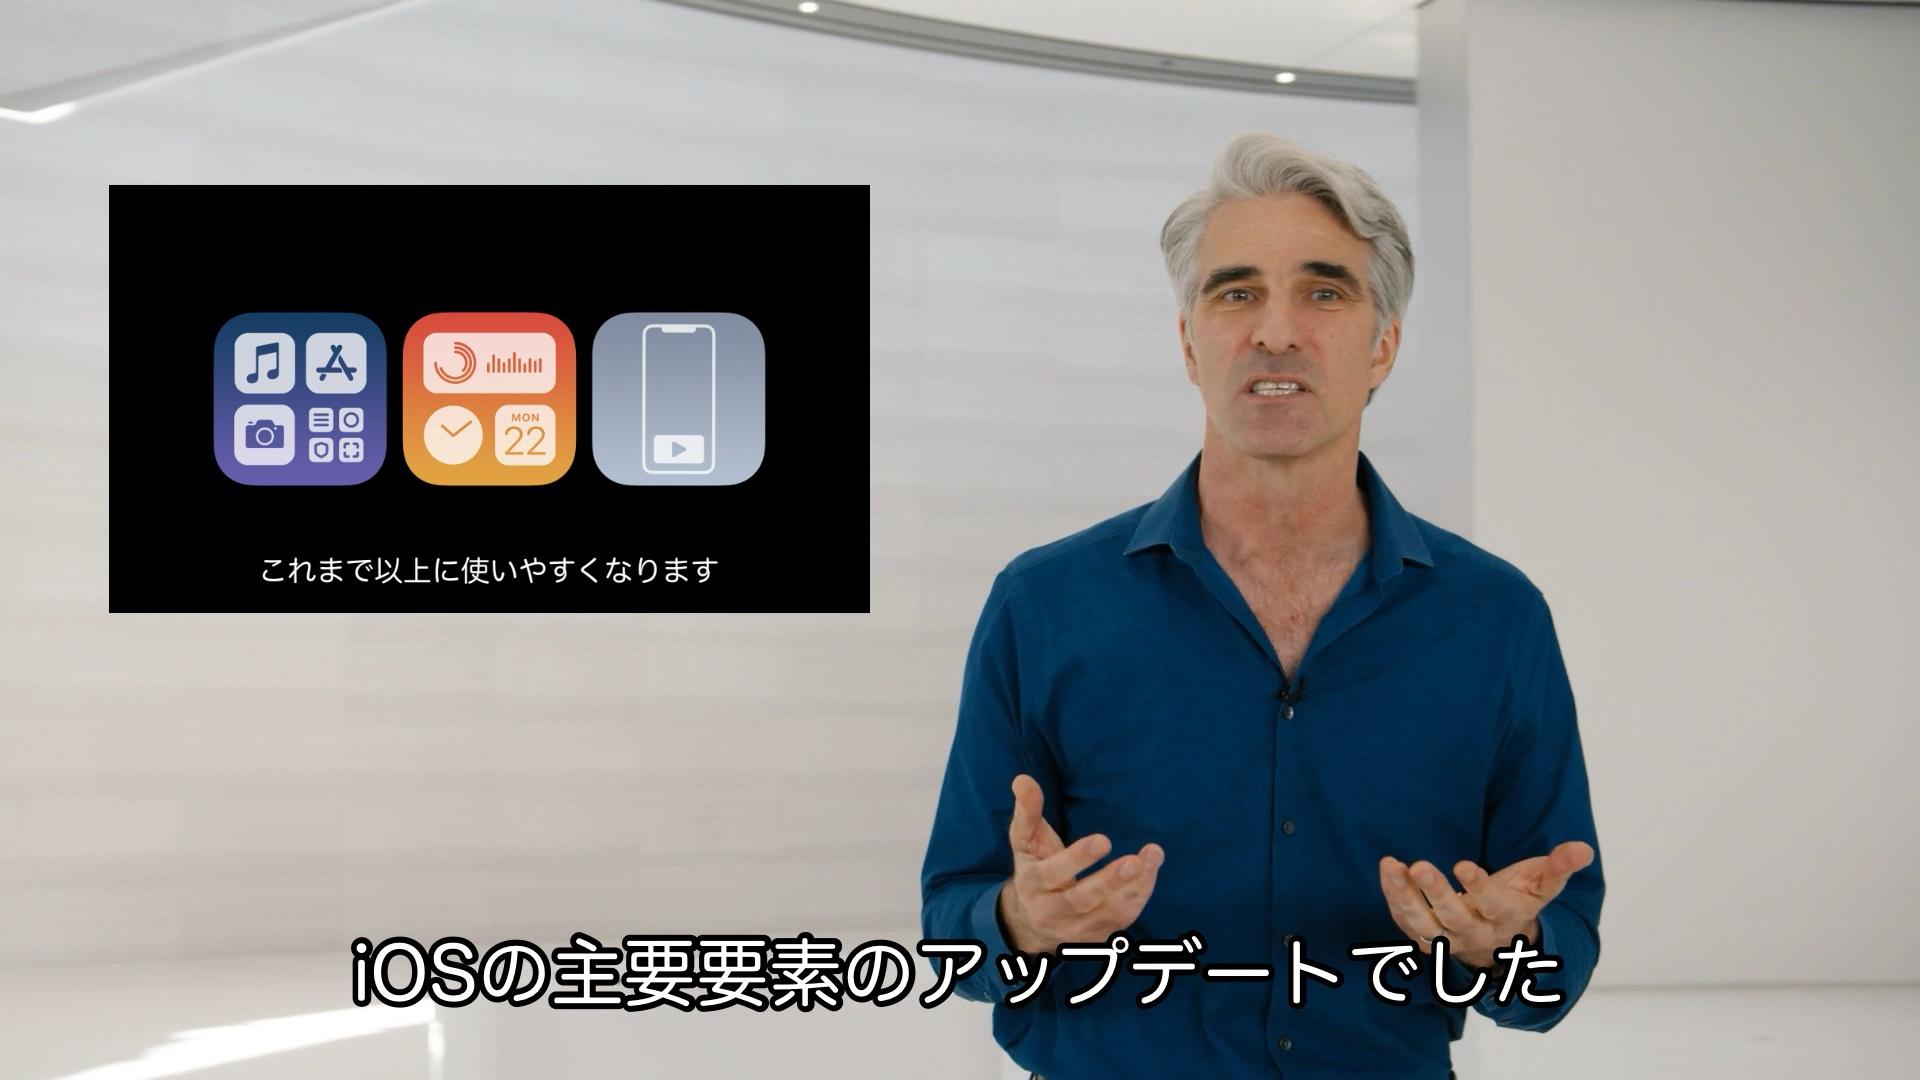 iOS 14の3つの新機能